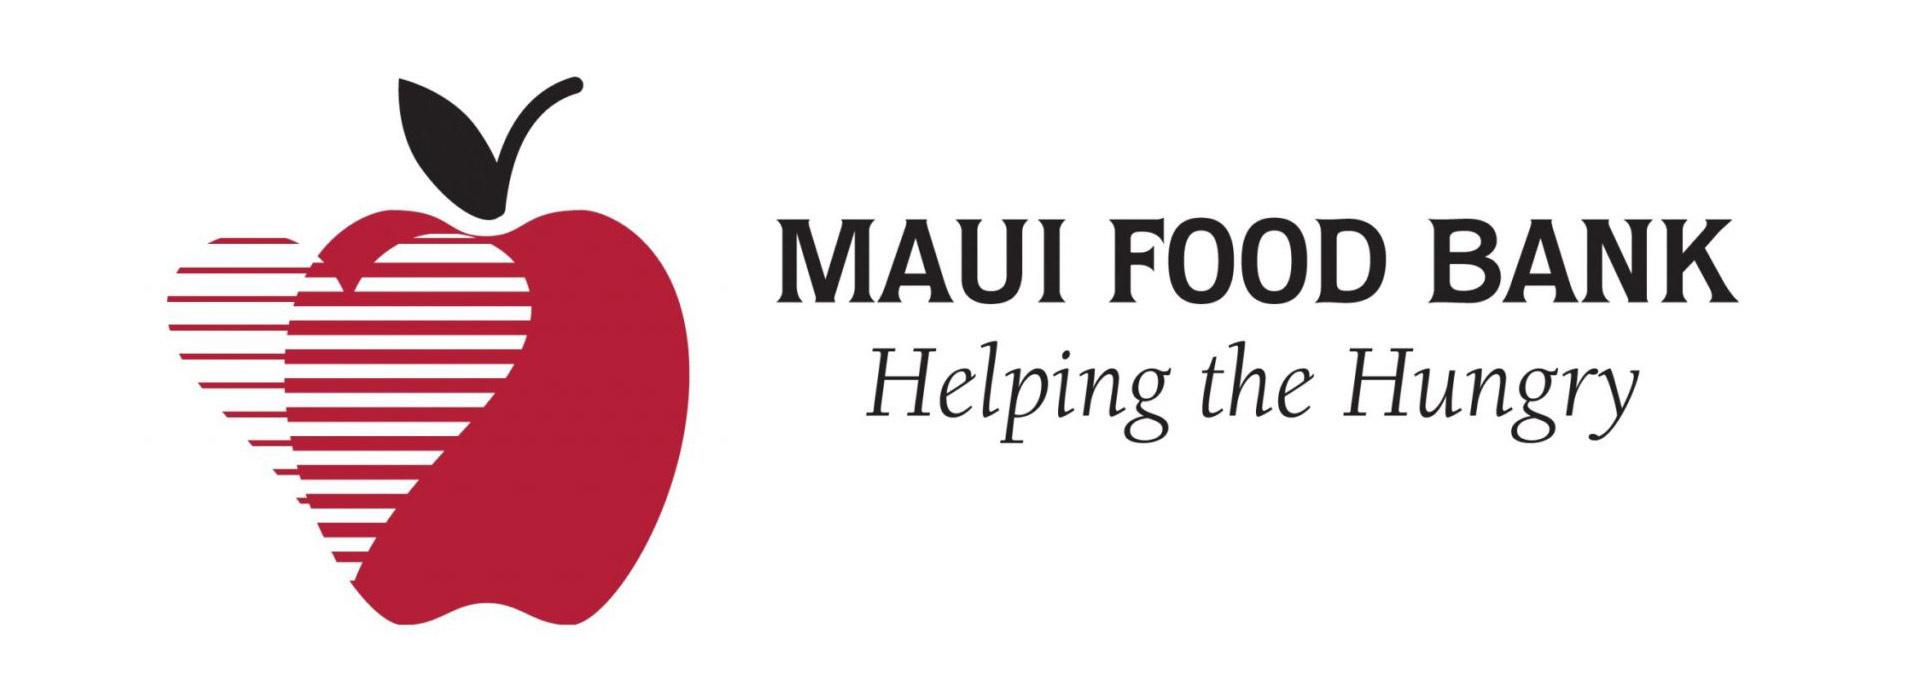 Maui Food Bank